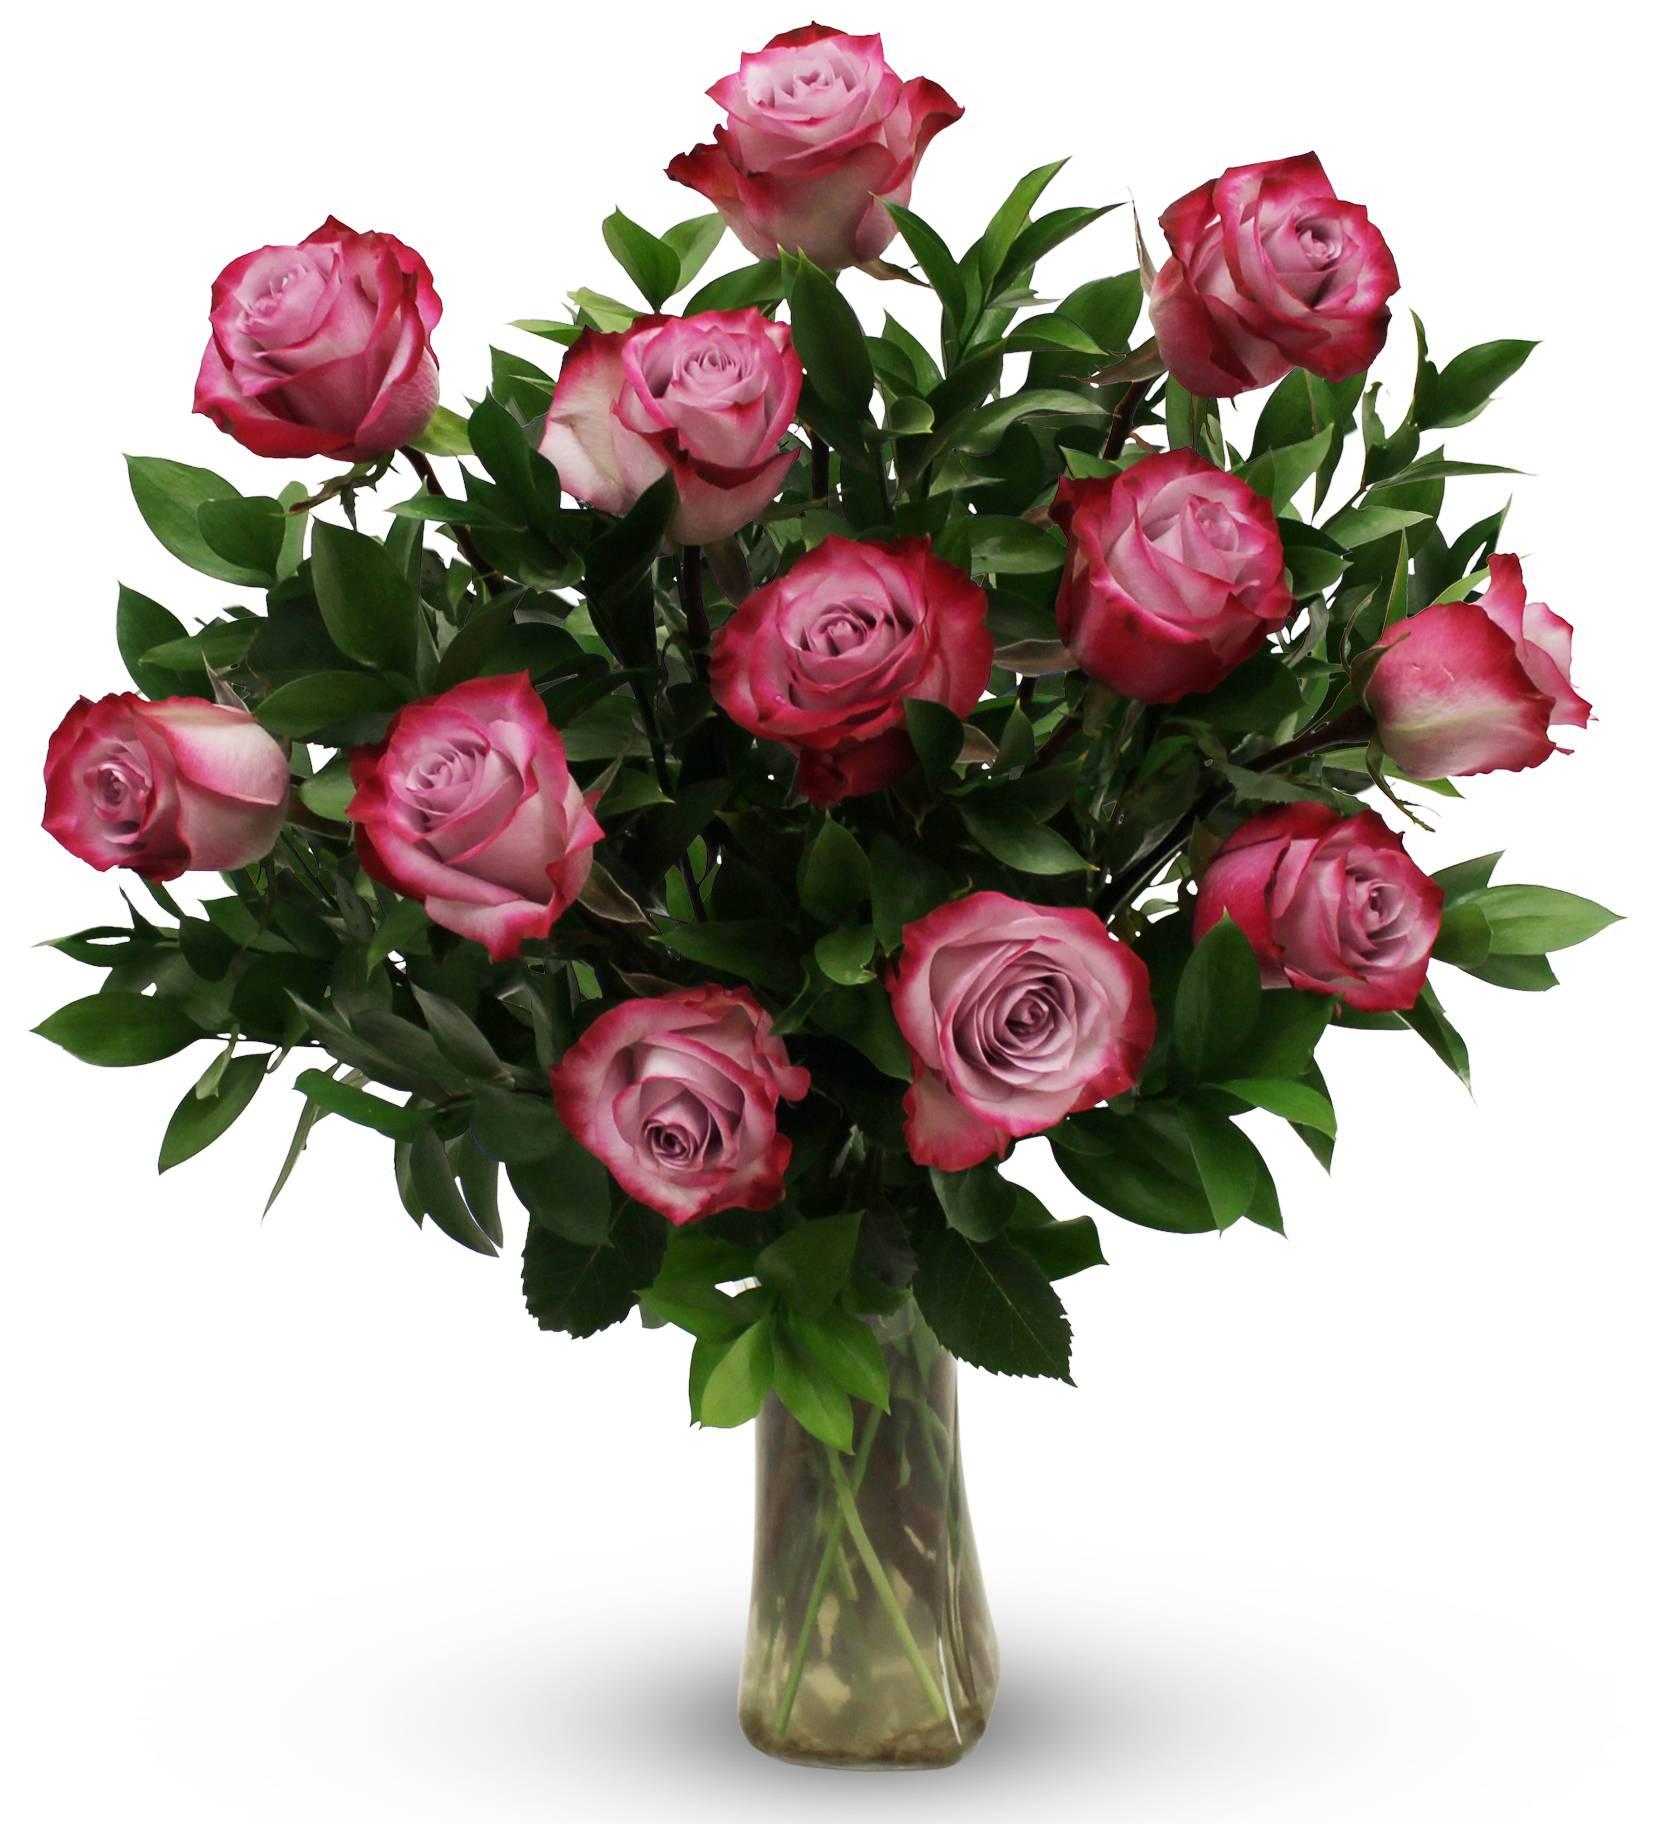 Abbruzzese Bouquet